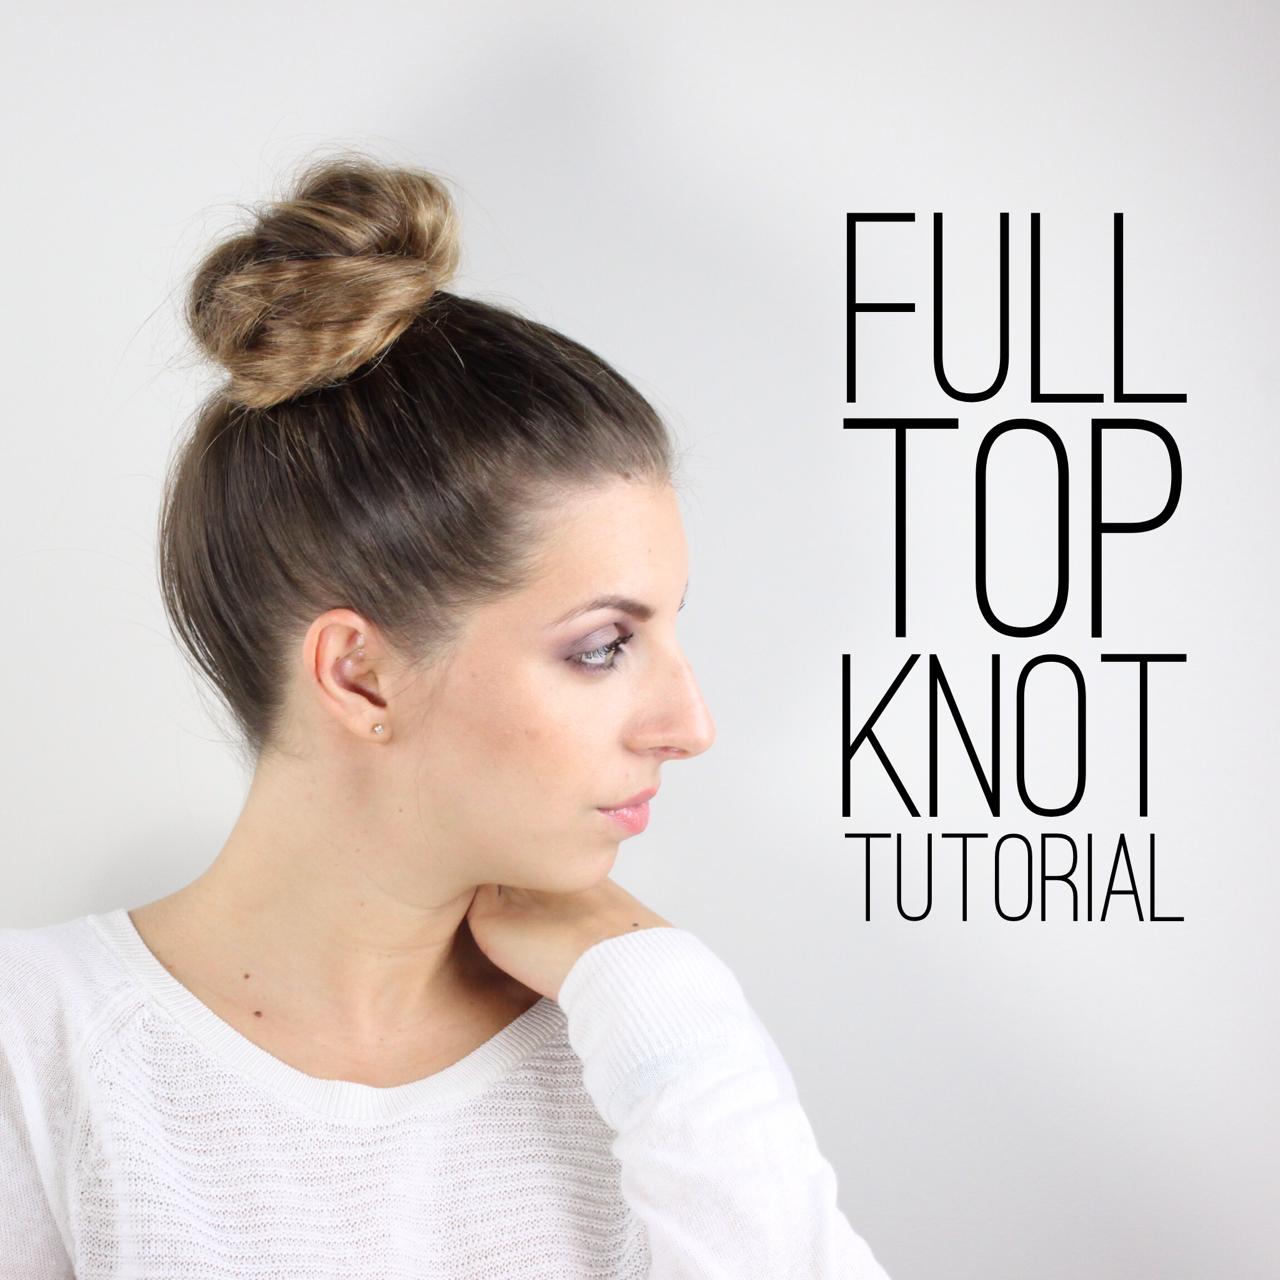 full top knot tutorial